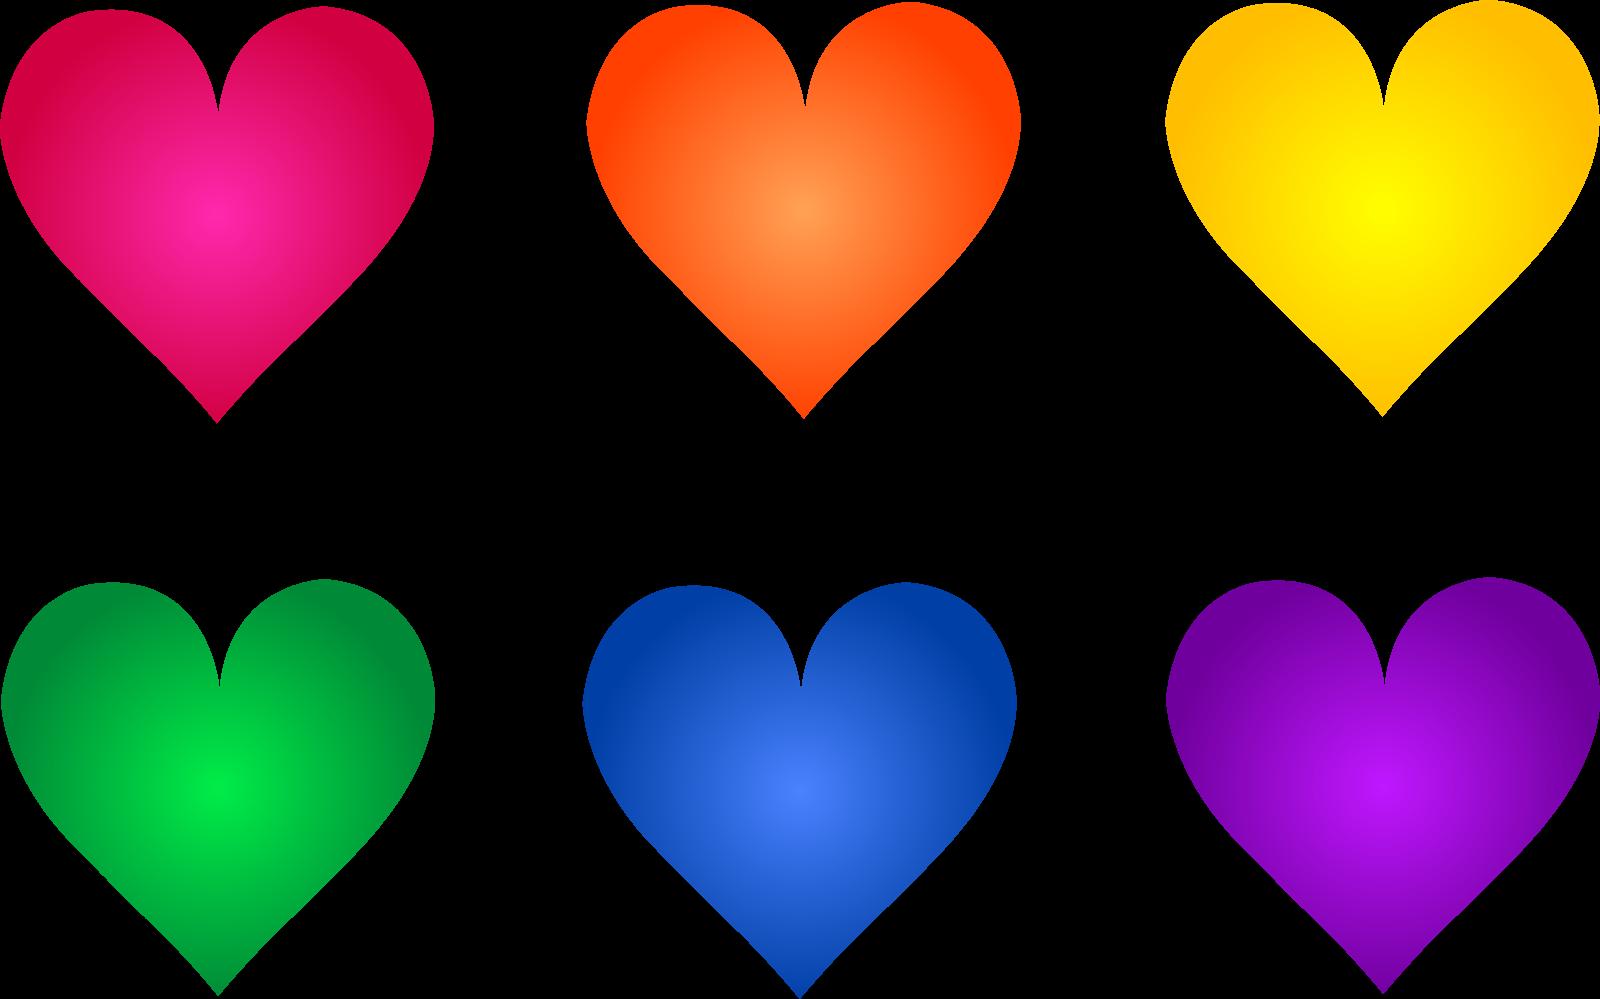 Heat clipart coloured heart. Mitchell pt england school